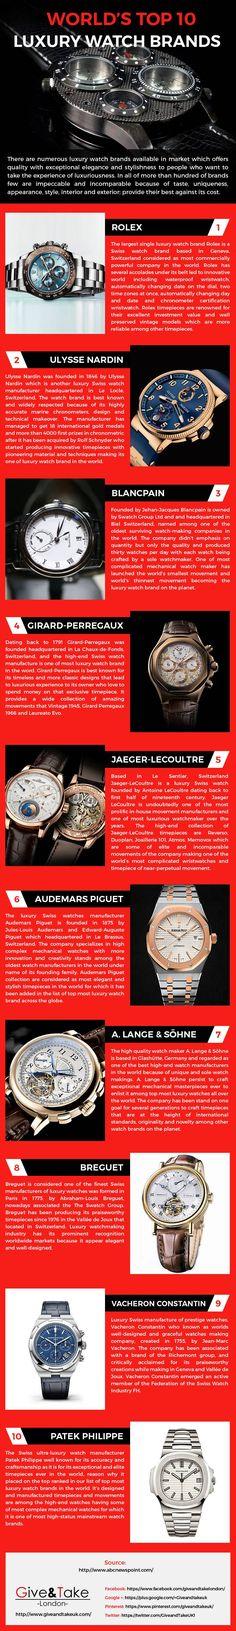 World's Top 10 Luxury Watch Brands #Infographic